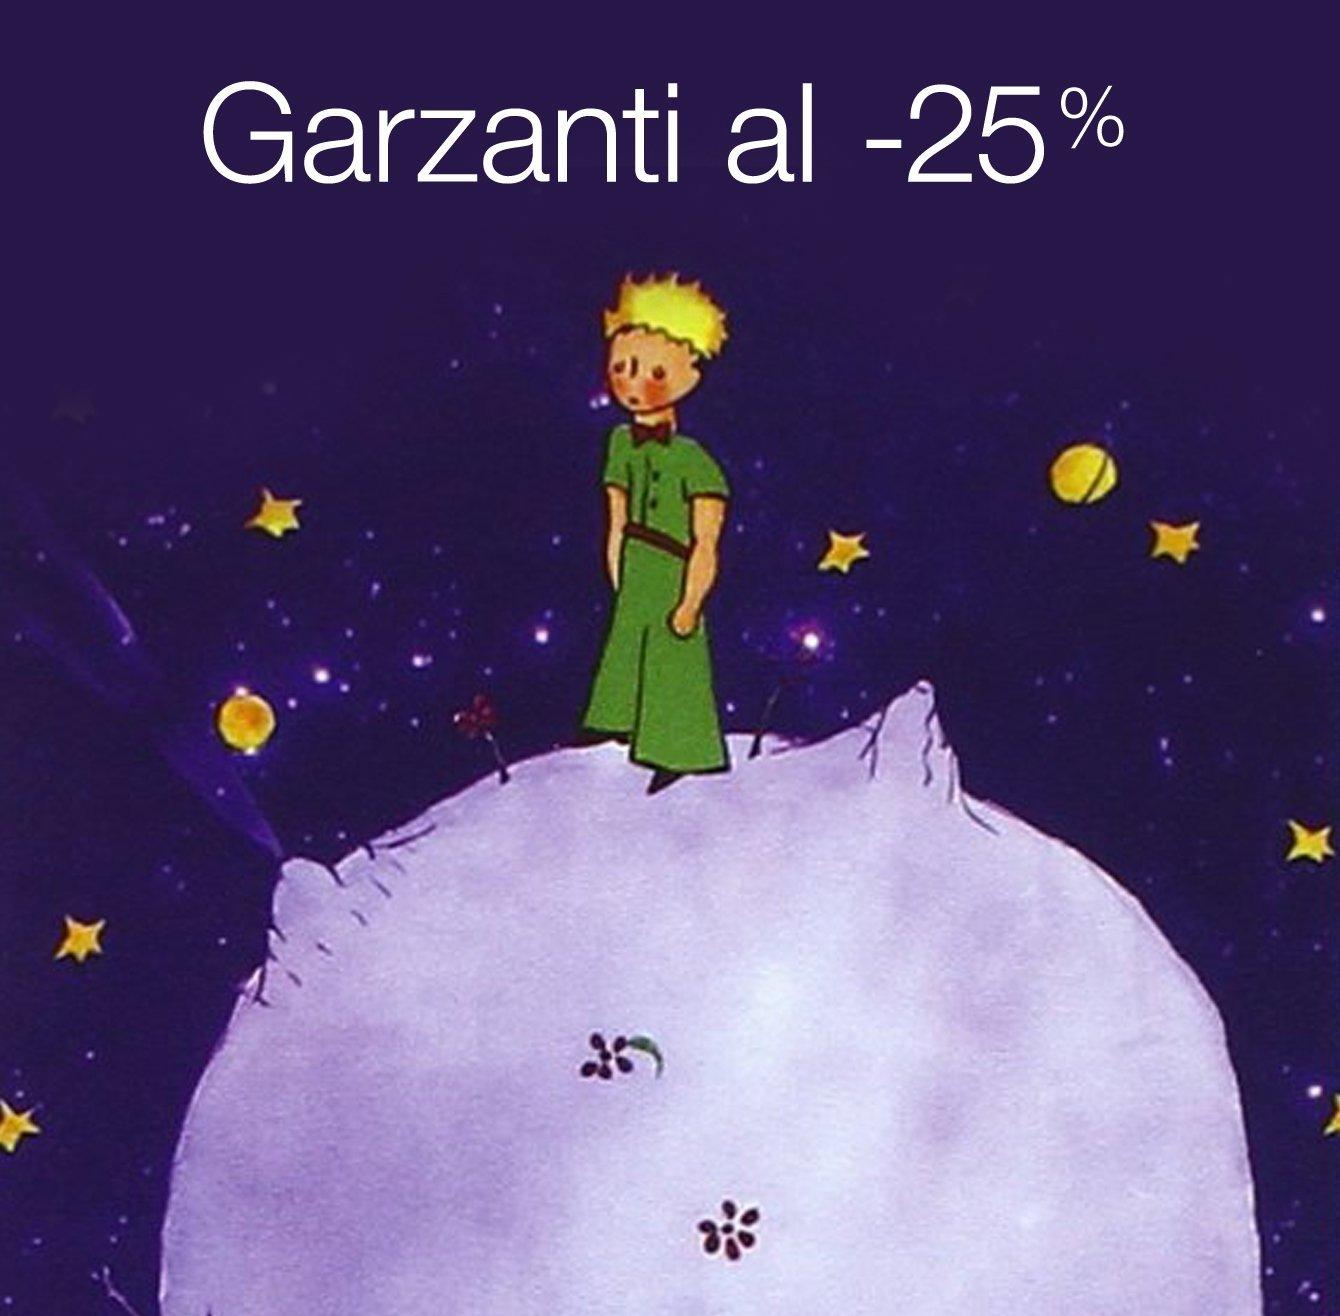 Garzanti al -25%